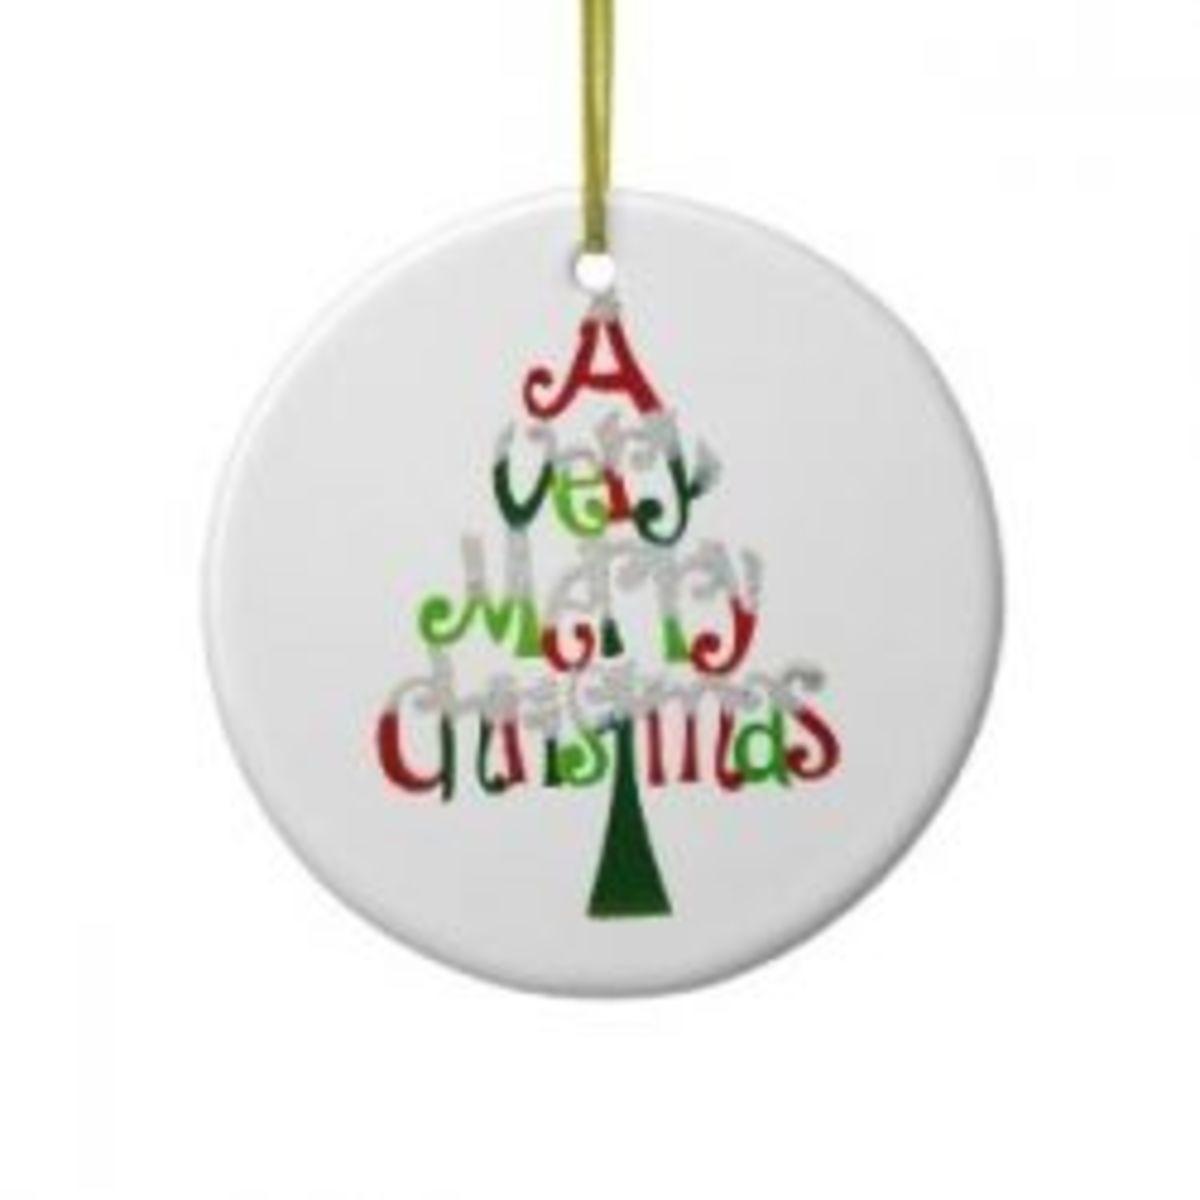 A Very Merry Christmas Ornament